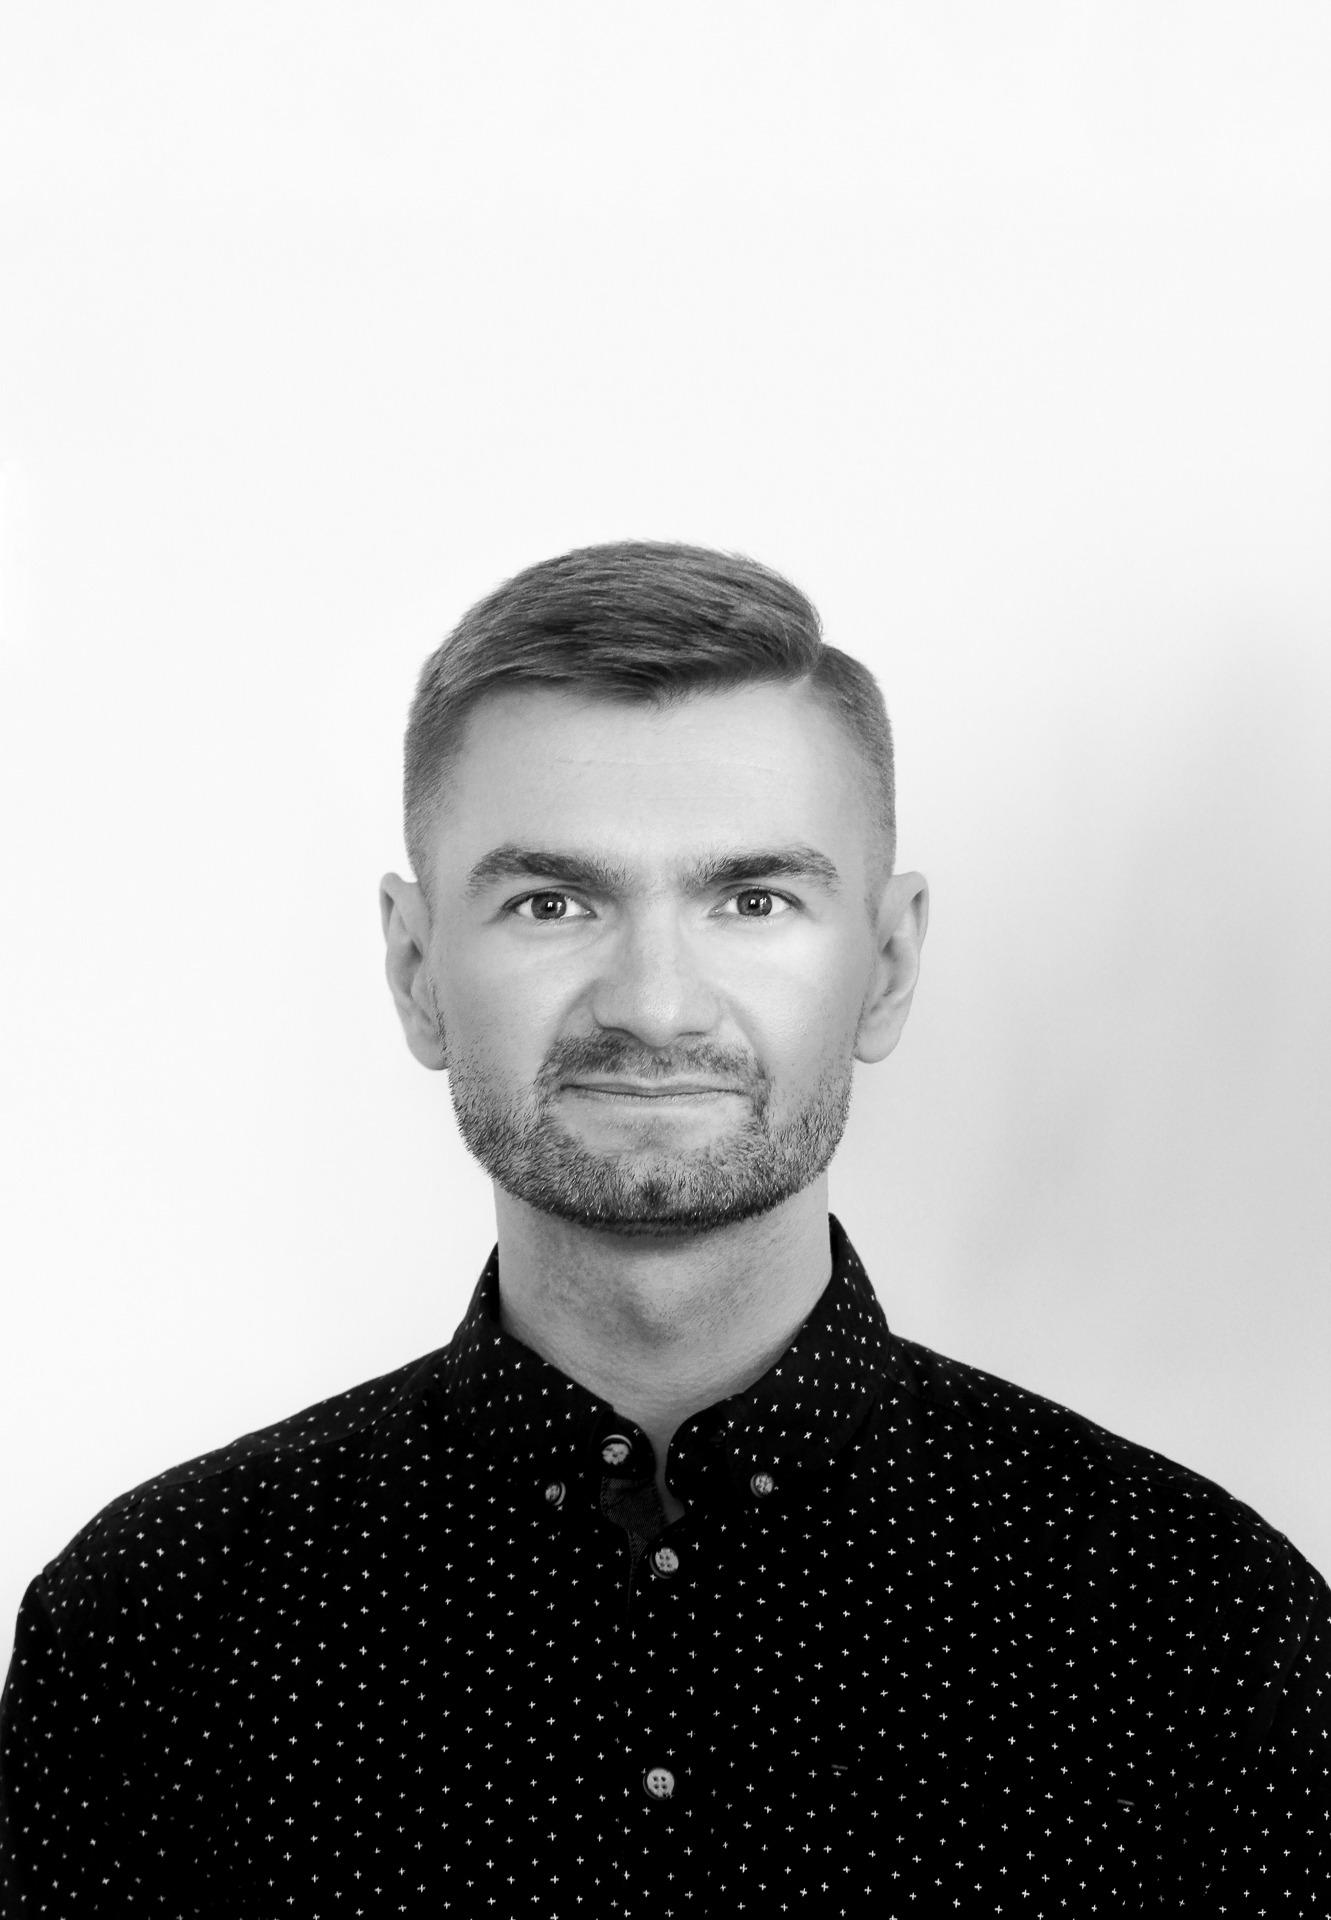 Marcin Kłosowski Psychoterapeuta psycholog Konteksty psychoterapia Warszawa psychoterapeuta psychoterapia terapia psychodynamiczna